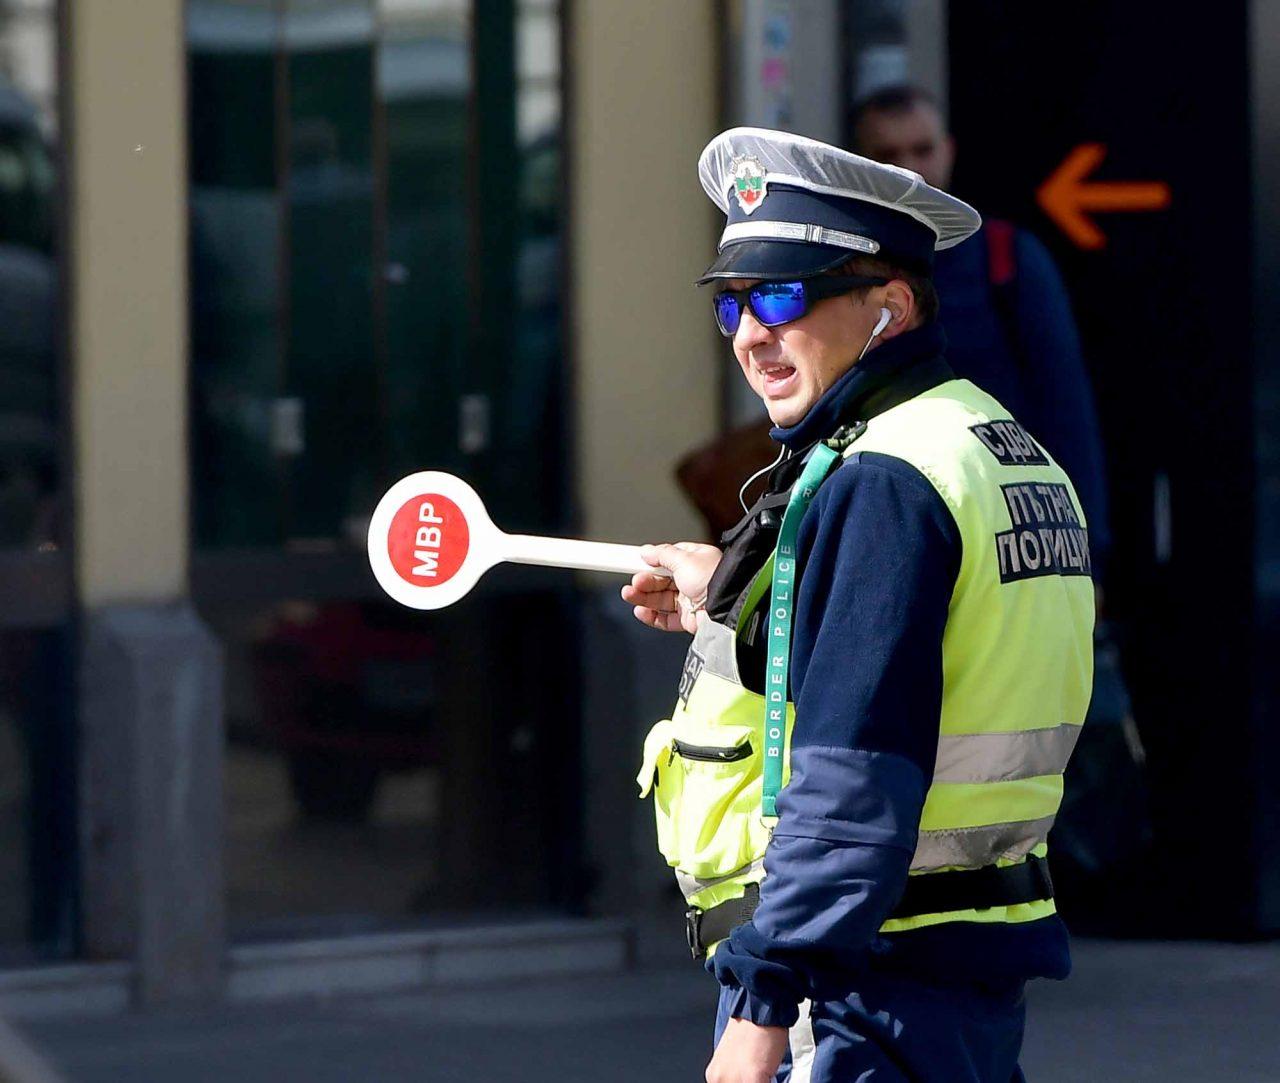 Пътна Полиция Пилицай Регулировчик (2)